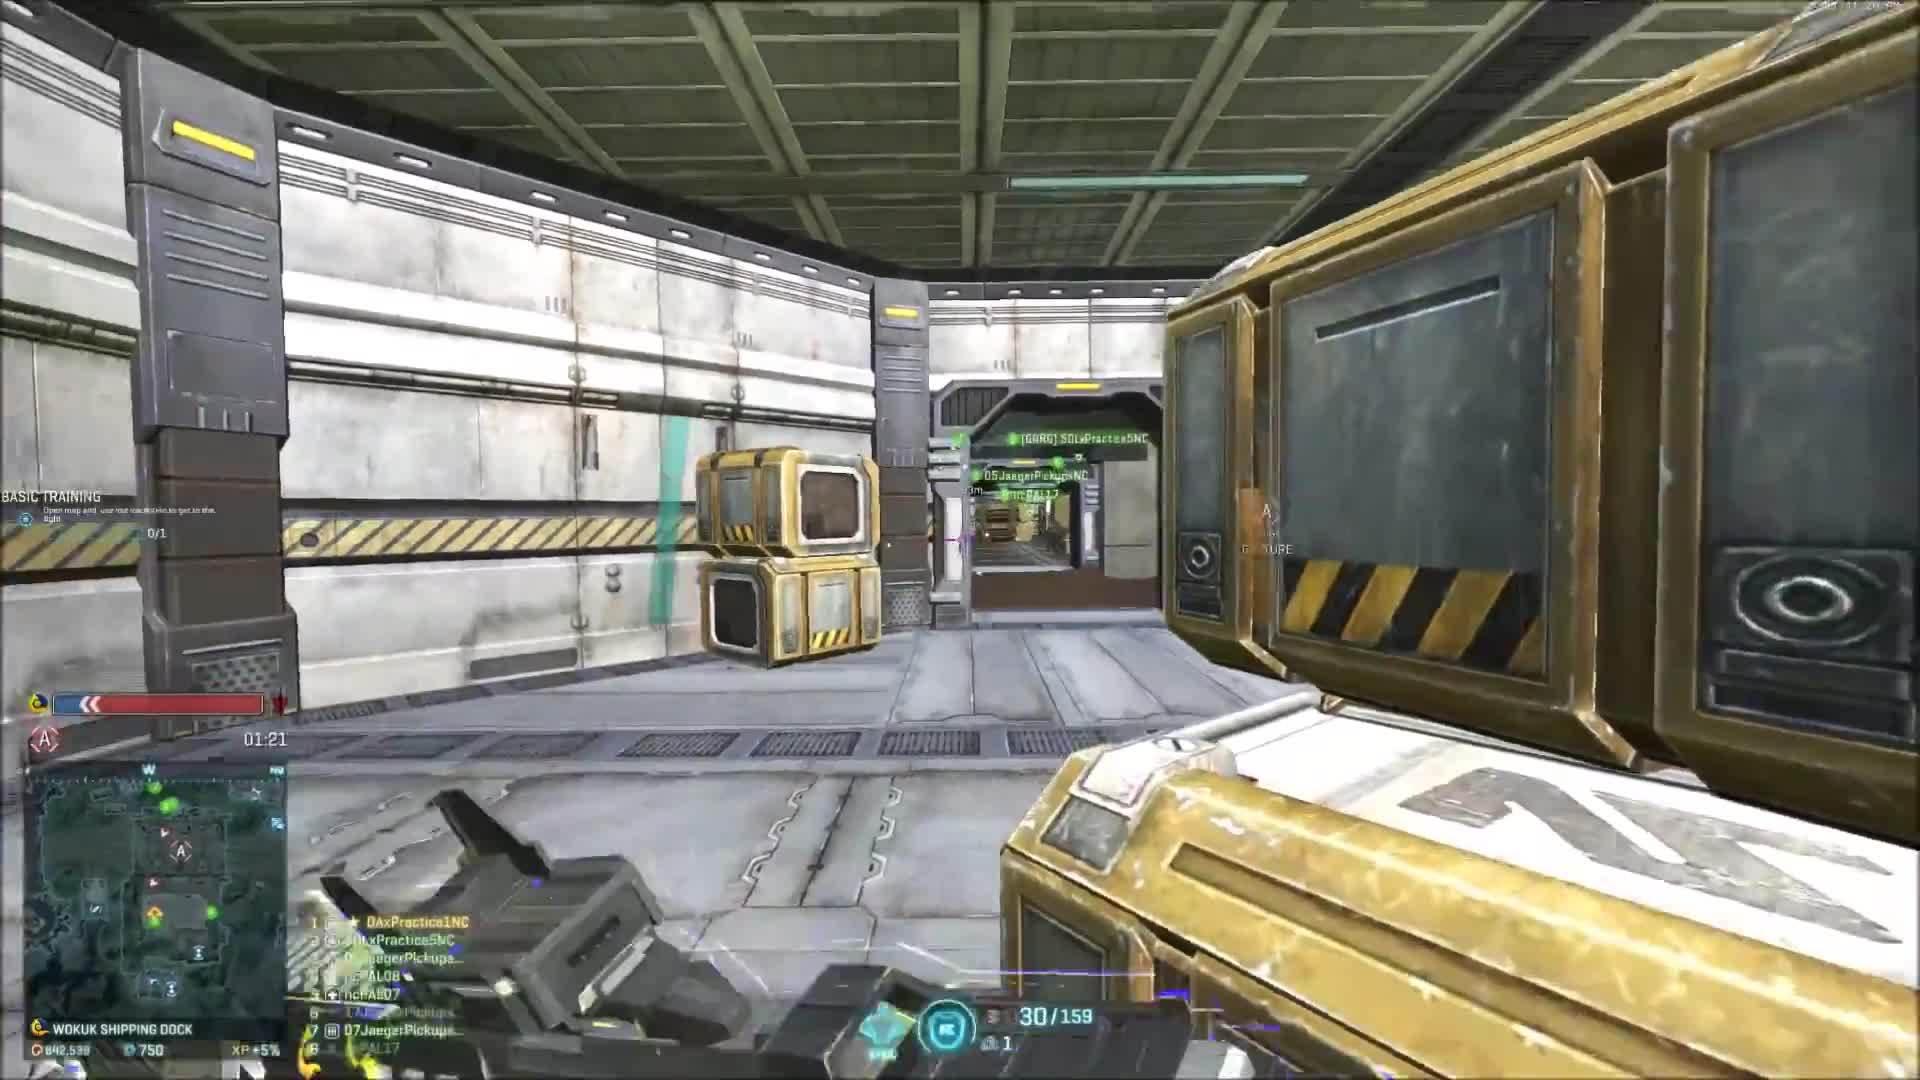 EmeraldPS2, emeraldps2, Random Pickup Match GIFs